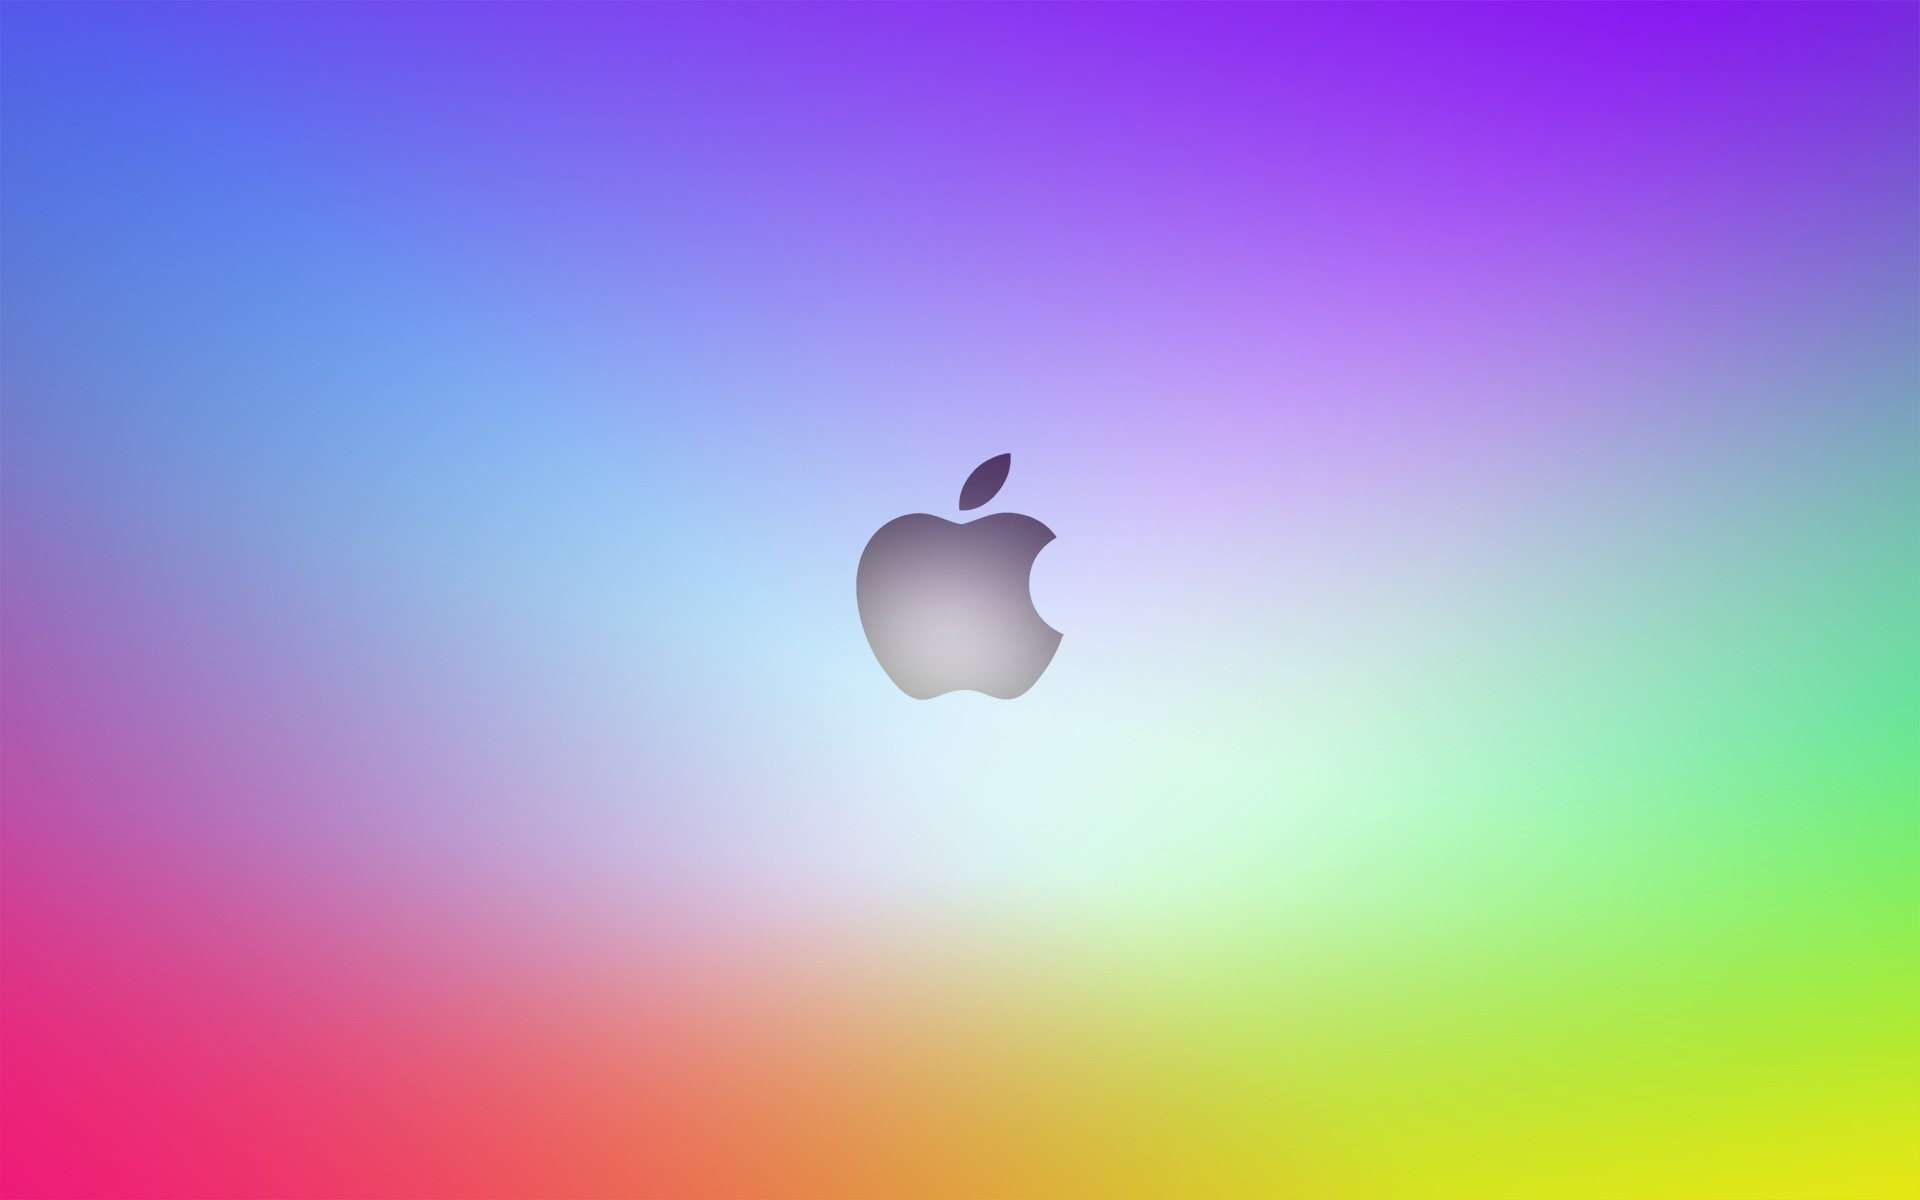 Charming Apple Wallpaper Hd: Terrific Apple Mac Osx Colorful Wallpapers  1920x1200px